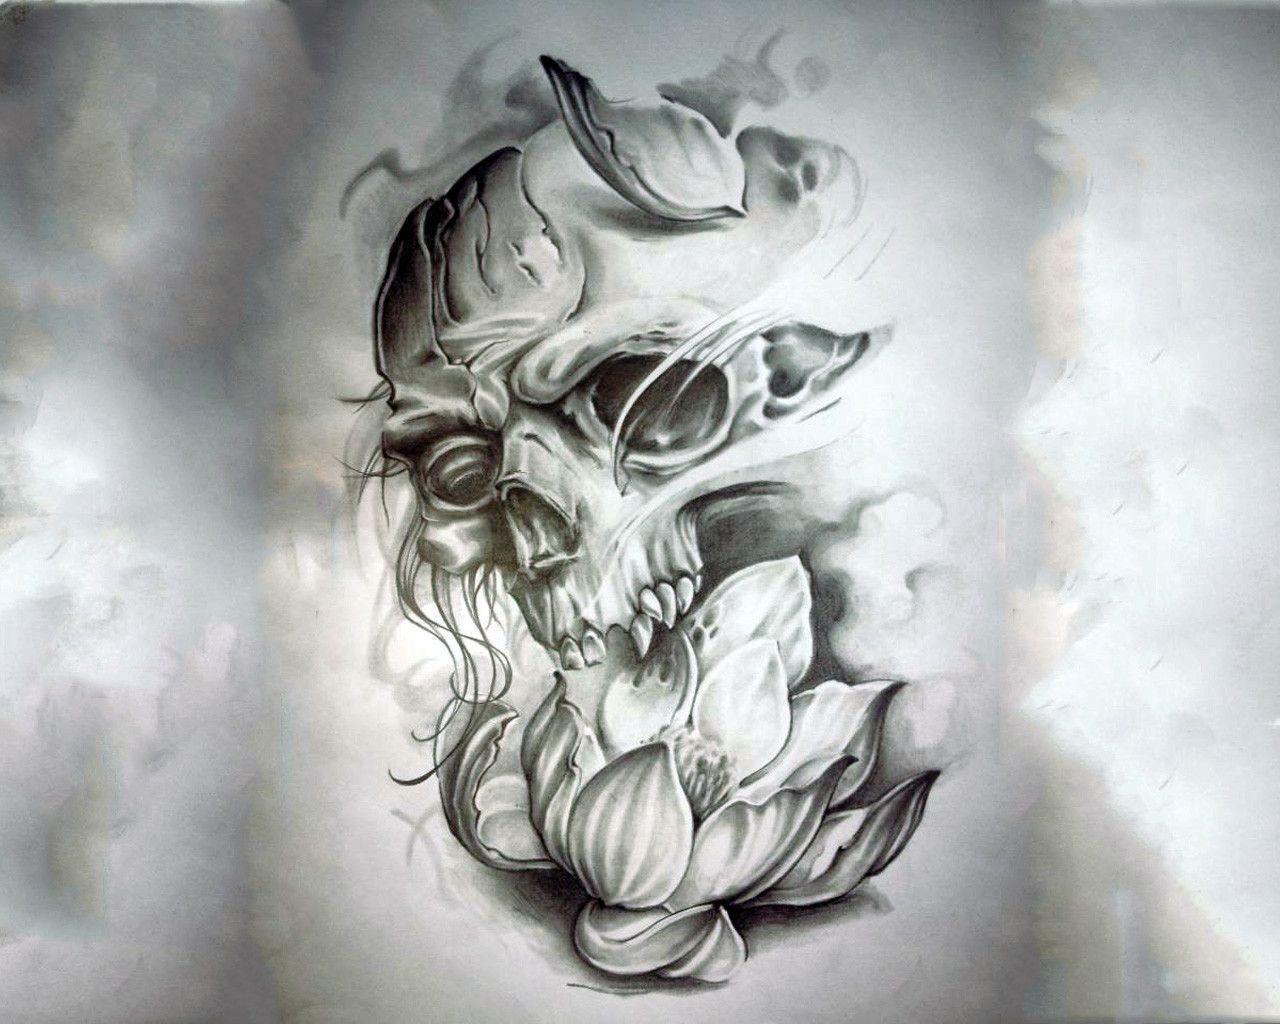 Tattoo Design Wallpapers - Wallpaper Cave